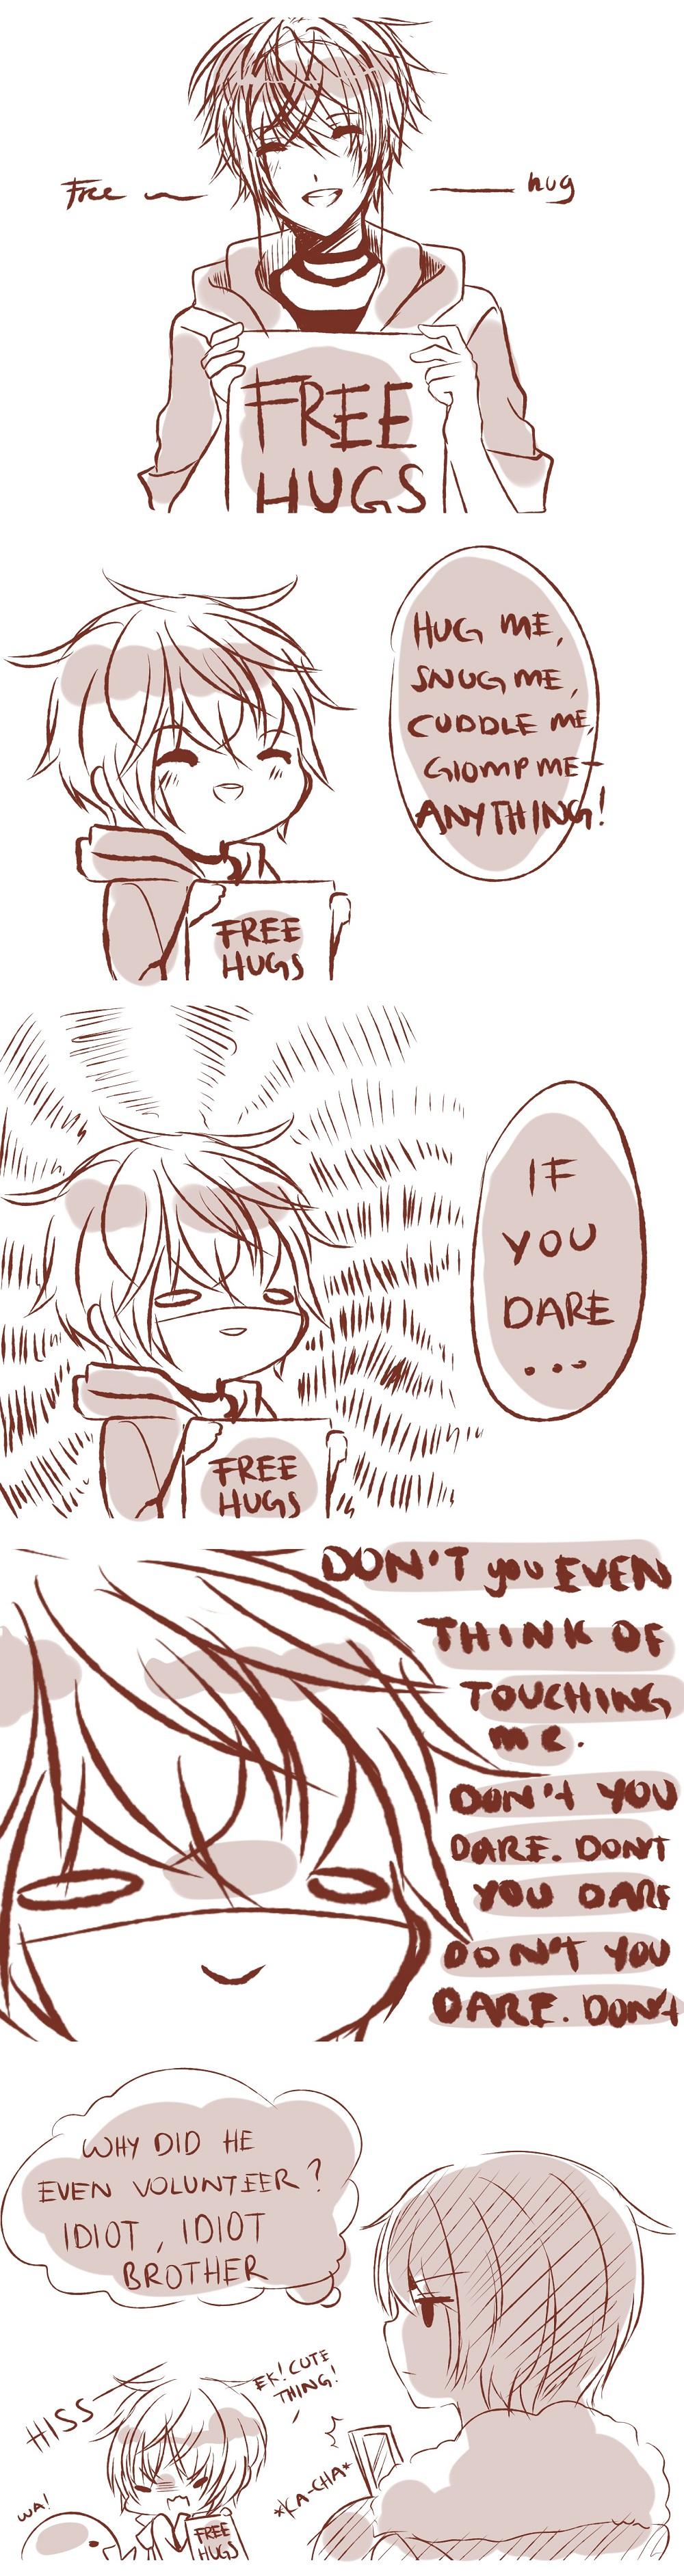 Free hugs by Hachiimi